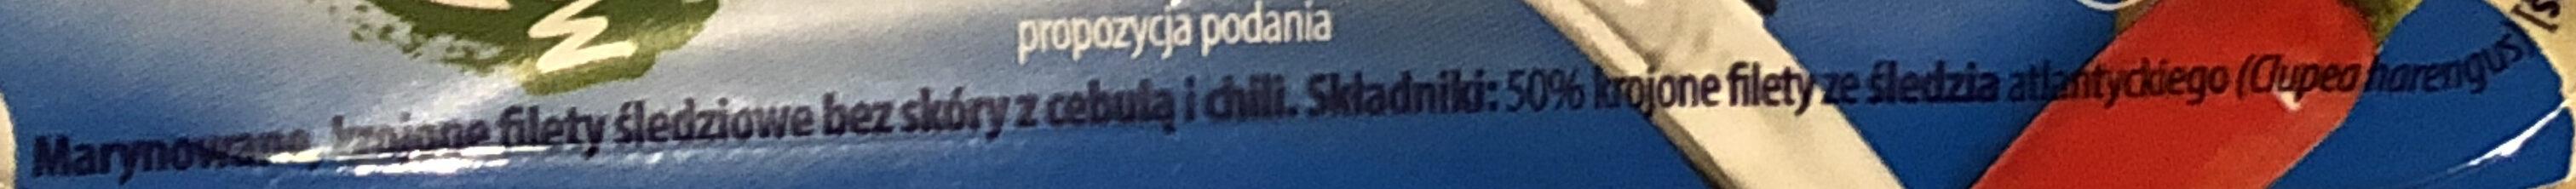 Śledzik na raz Pikantny - Składniki - pl